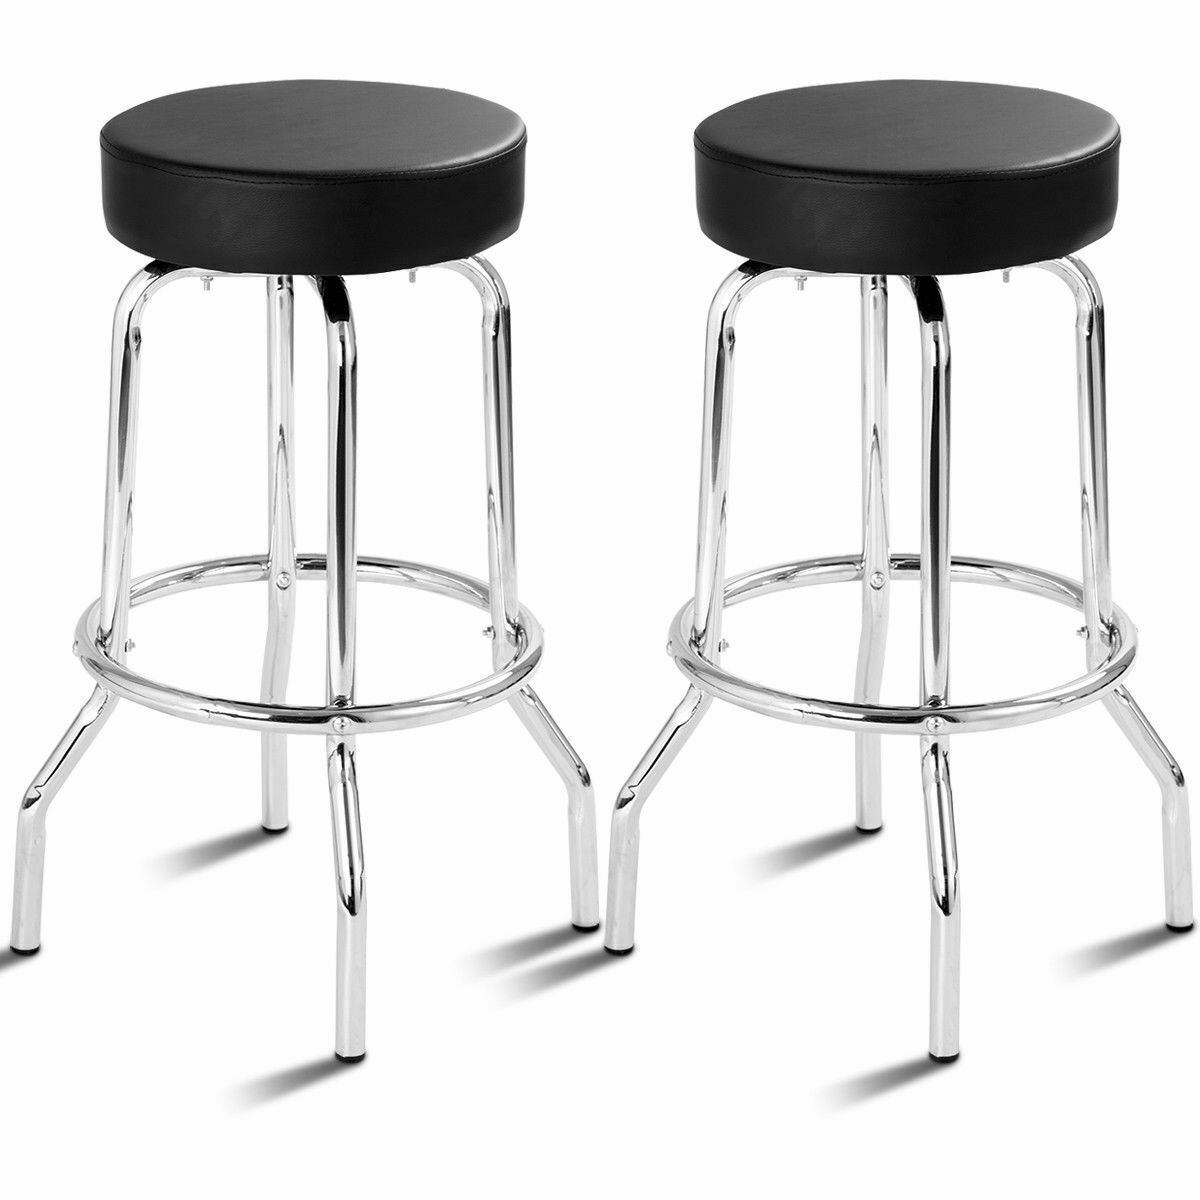 Set Of 2 Bar Stools Pu Leather Round Seat Backless Swivel Pub